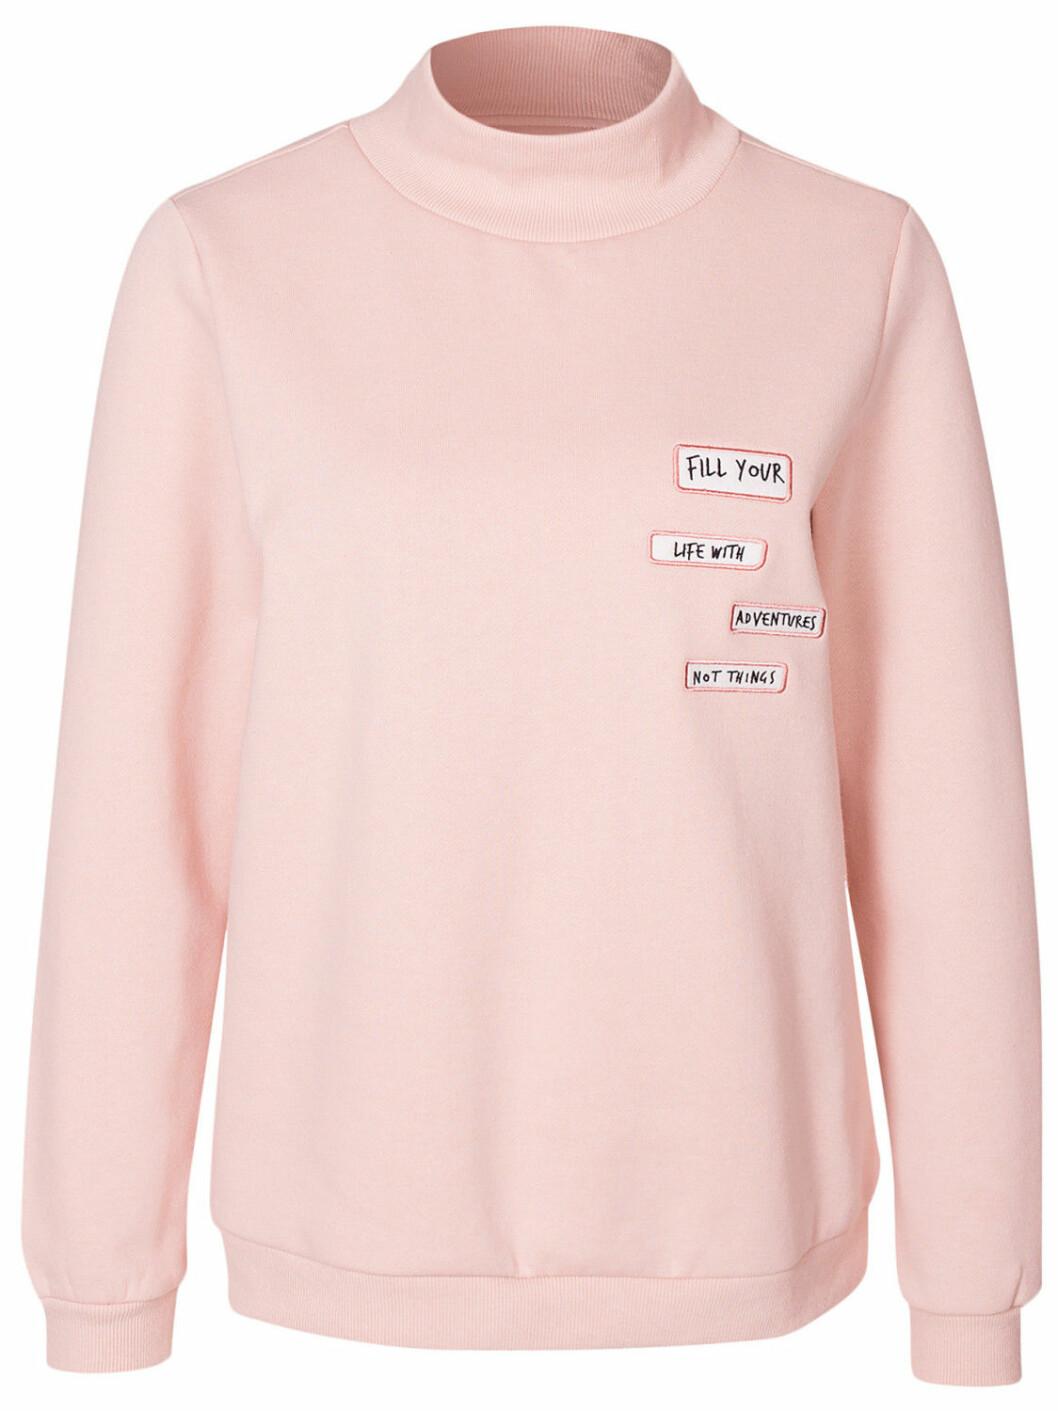 rosa sweatshirt 2017